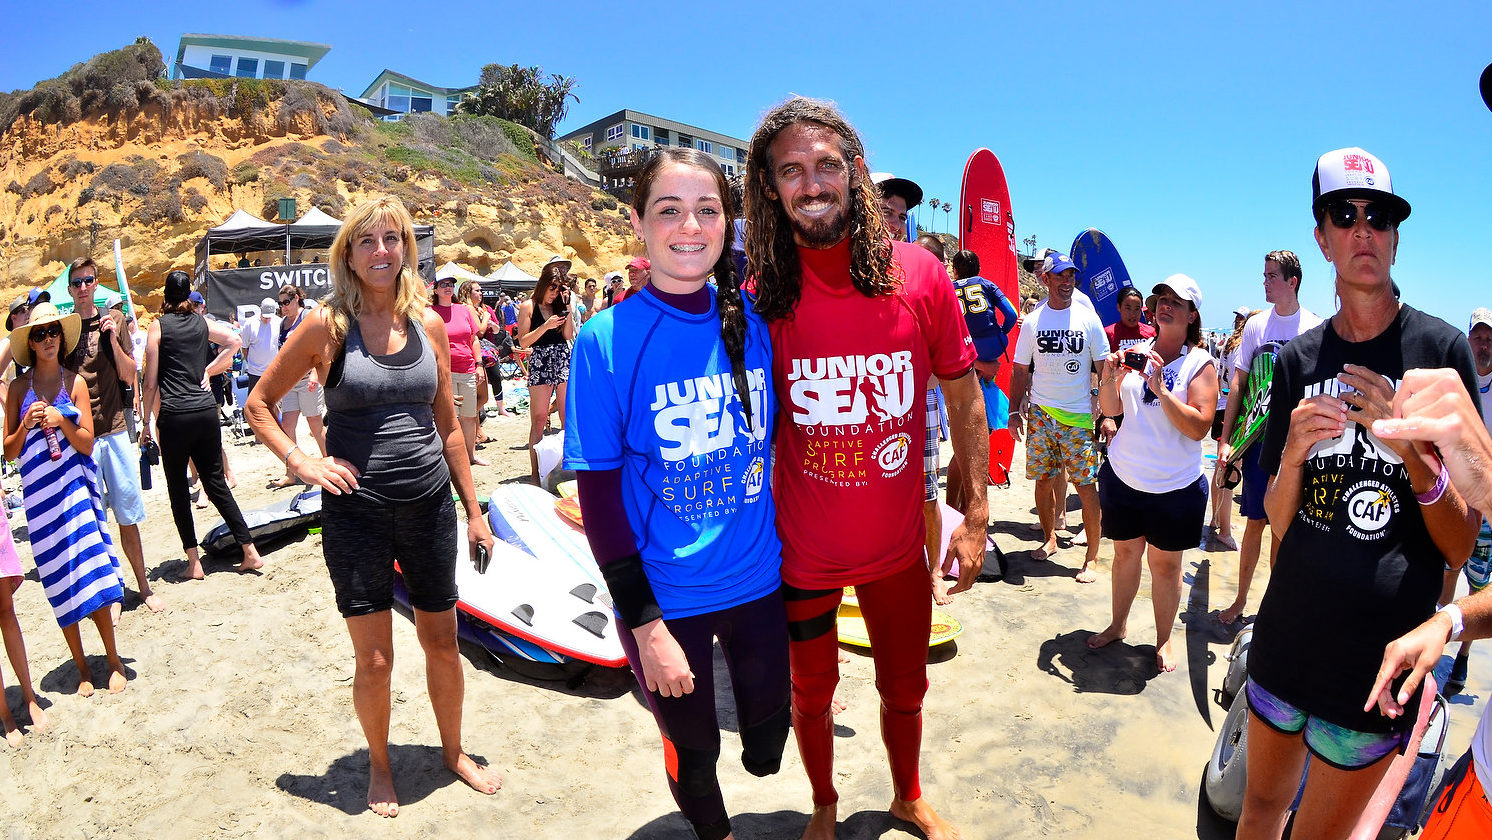 CAF Junior Seau Foundation Adaptive Surf Program at SwitchFoot BroAm at Moonlight Beach- Encinitas, CA.   July 9, 2016               ©2016 Rich Cruse  CrusePhoto.com